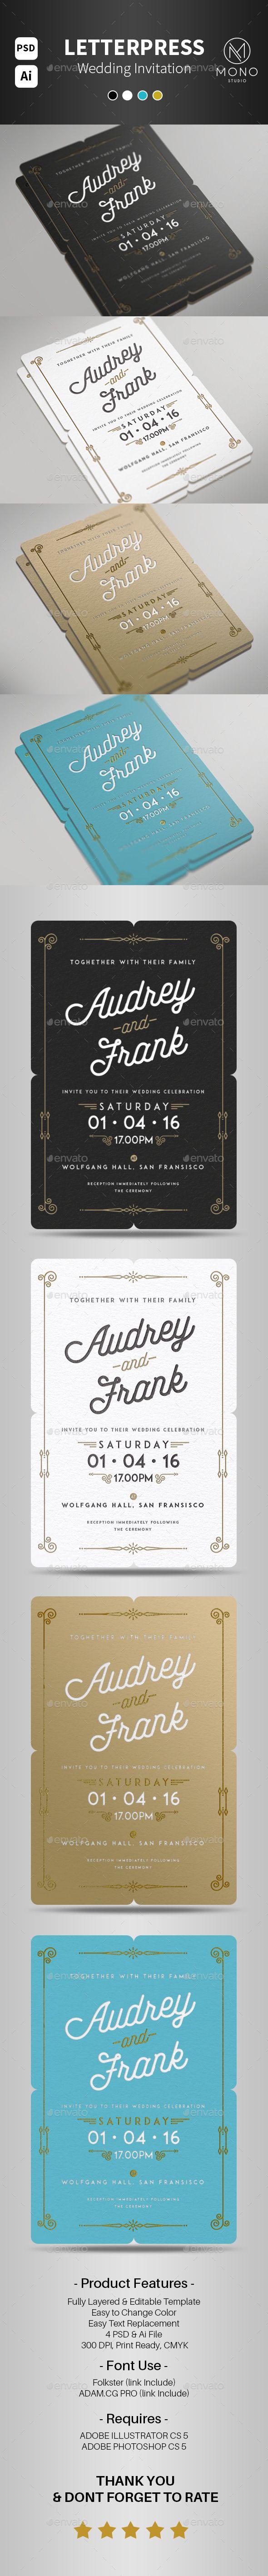 Letterpress Wedding Invitation Template PSD, Vector AI #design Download: http://graphicriver.net/item/letterpress-wedding-invitation/14145268?ref=ksioks